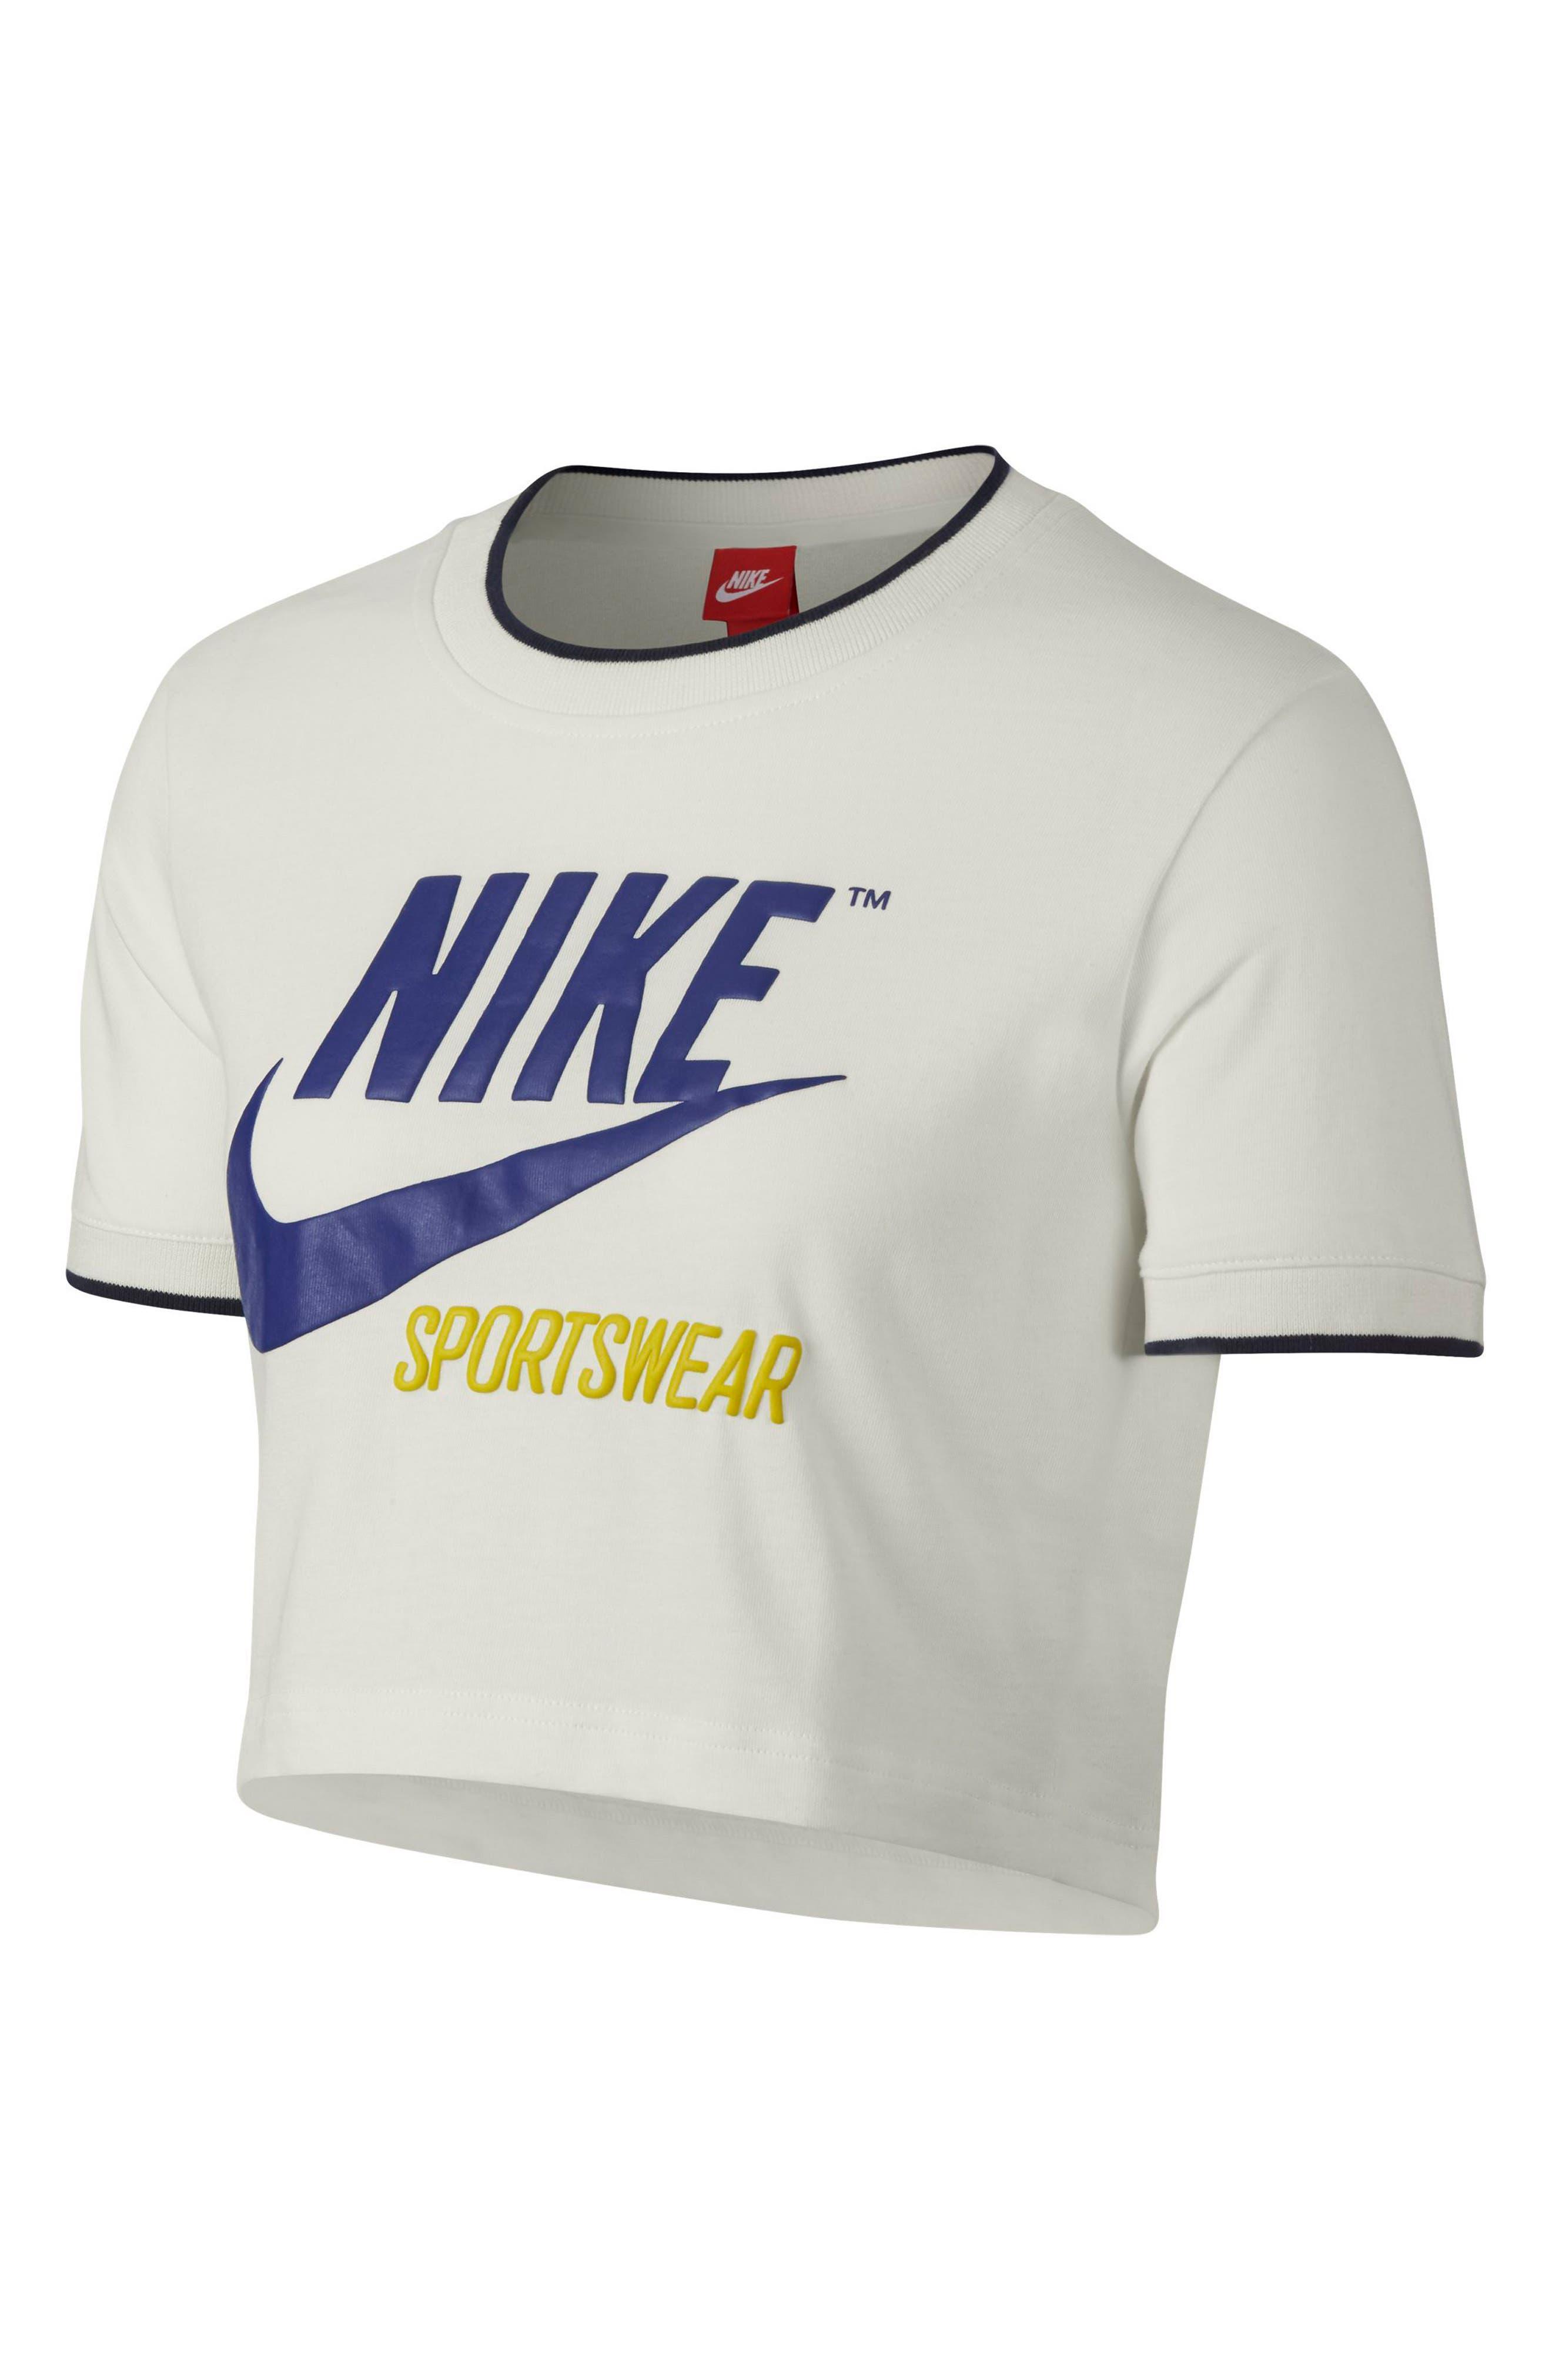 Sportswear Crop Top,                             Alternate thumbnail 6, color,                             Sail